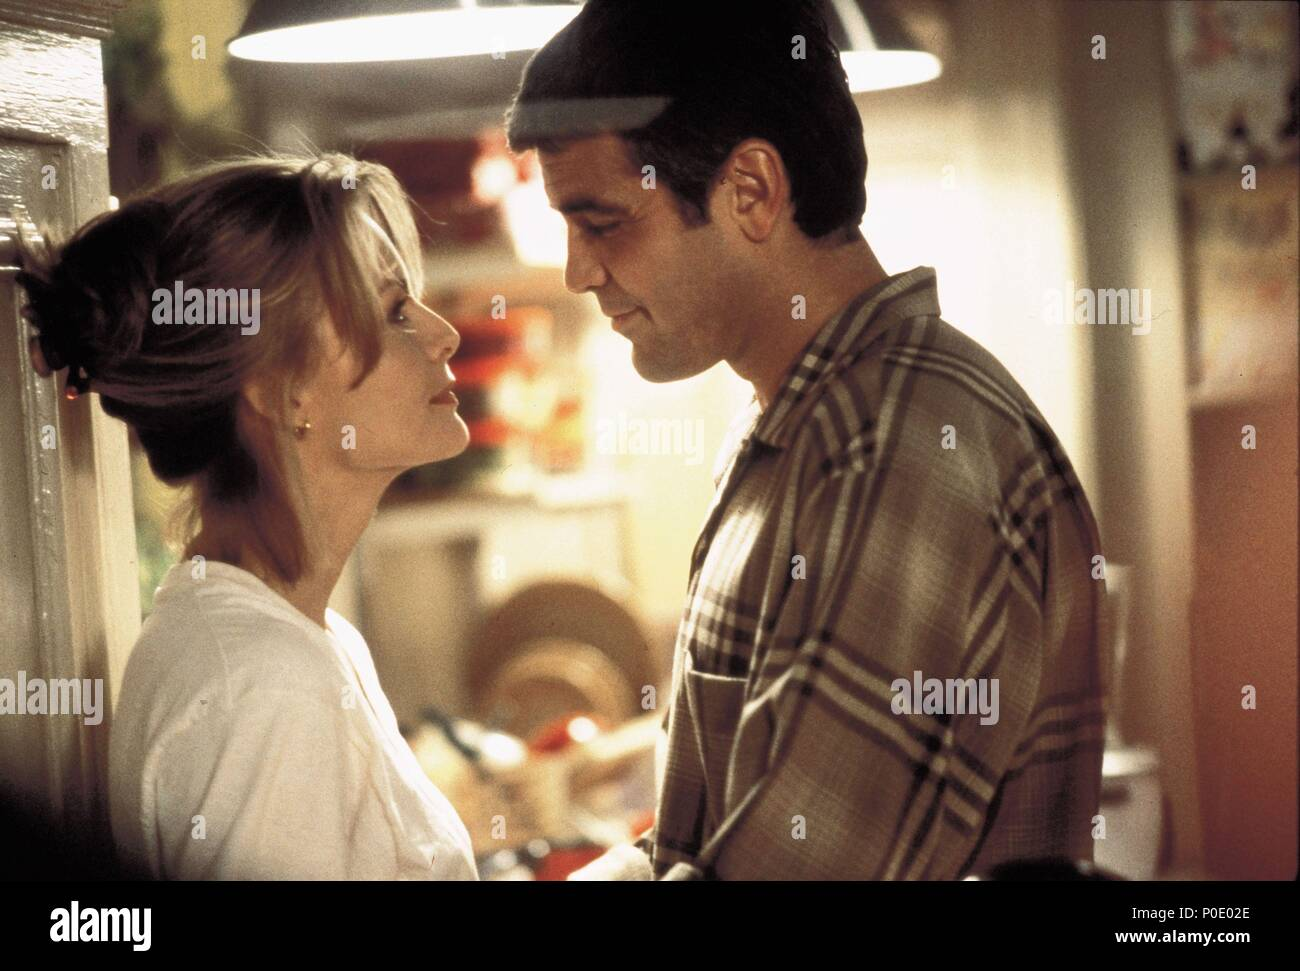 Original Film Title: ONE FINE DAY.  English Title: ONE FINE DAY.  Film Director: MICHAEL HOFFMAN.  Year: 1996.  Stars: GEORGE CLOONEY; MICHELLE PFEIFFER. Credit: 20TH CENTURY FOX / Album Stock Photo